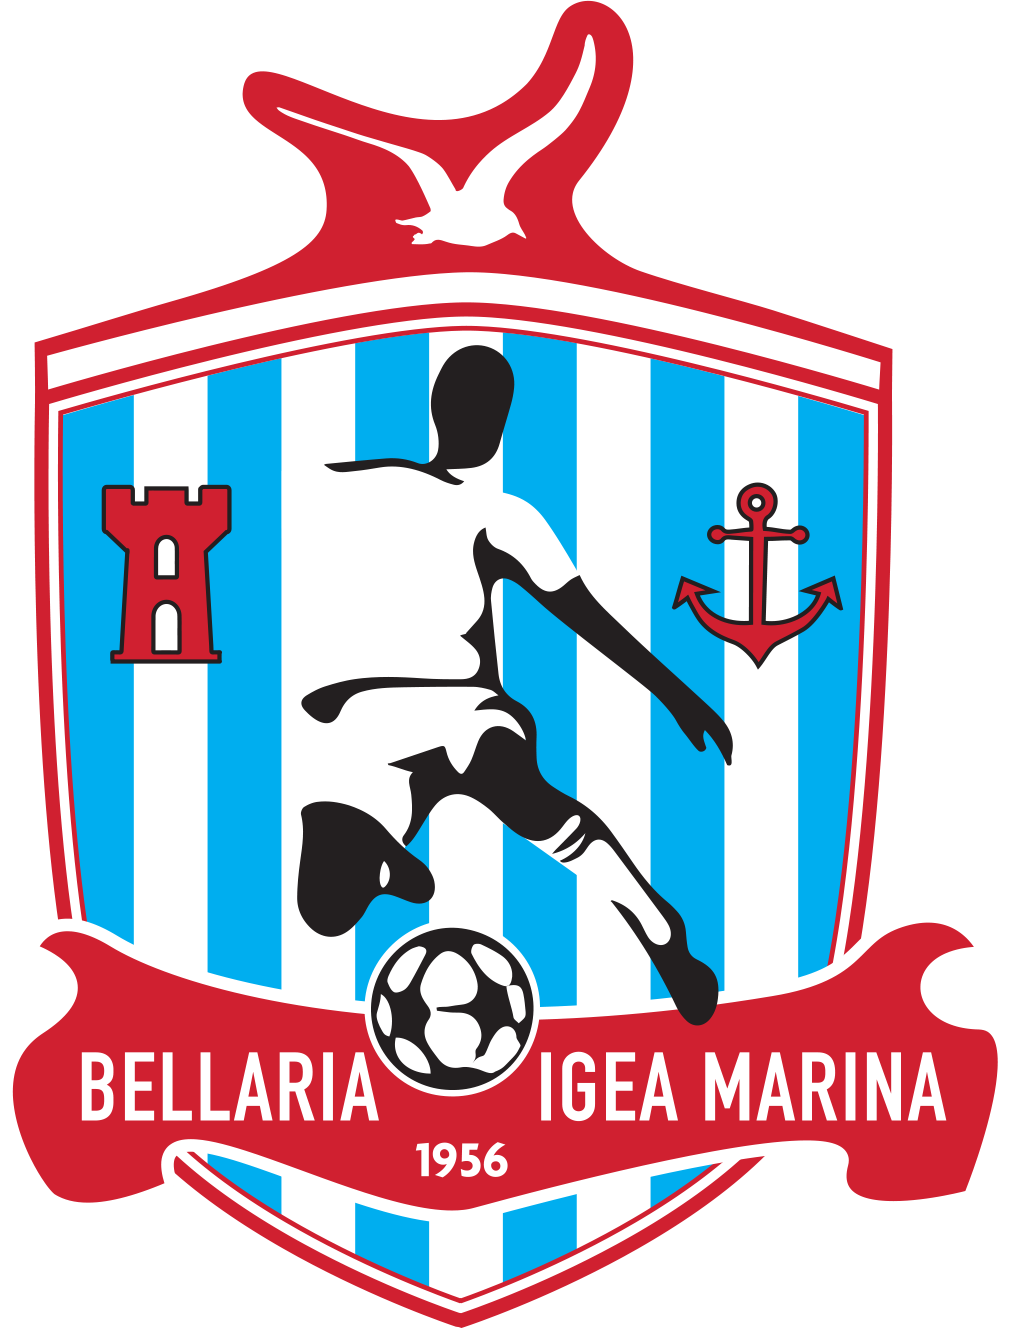 Calcio Bellaria Igea Marina 1956